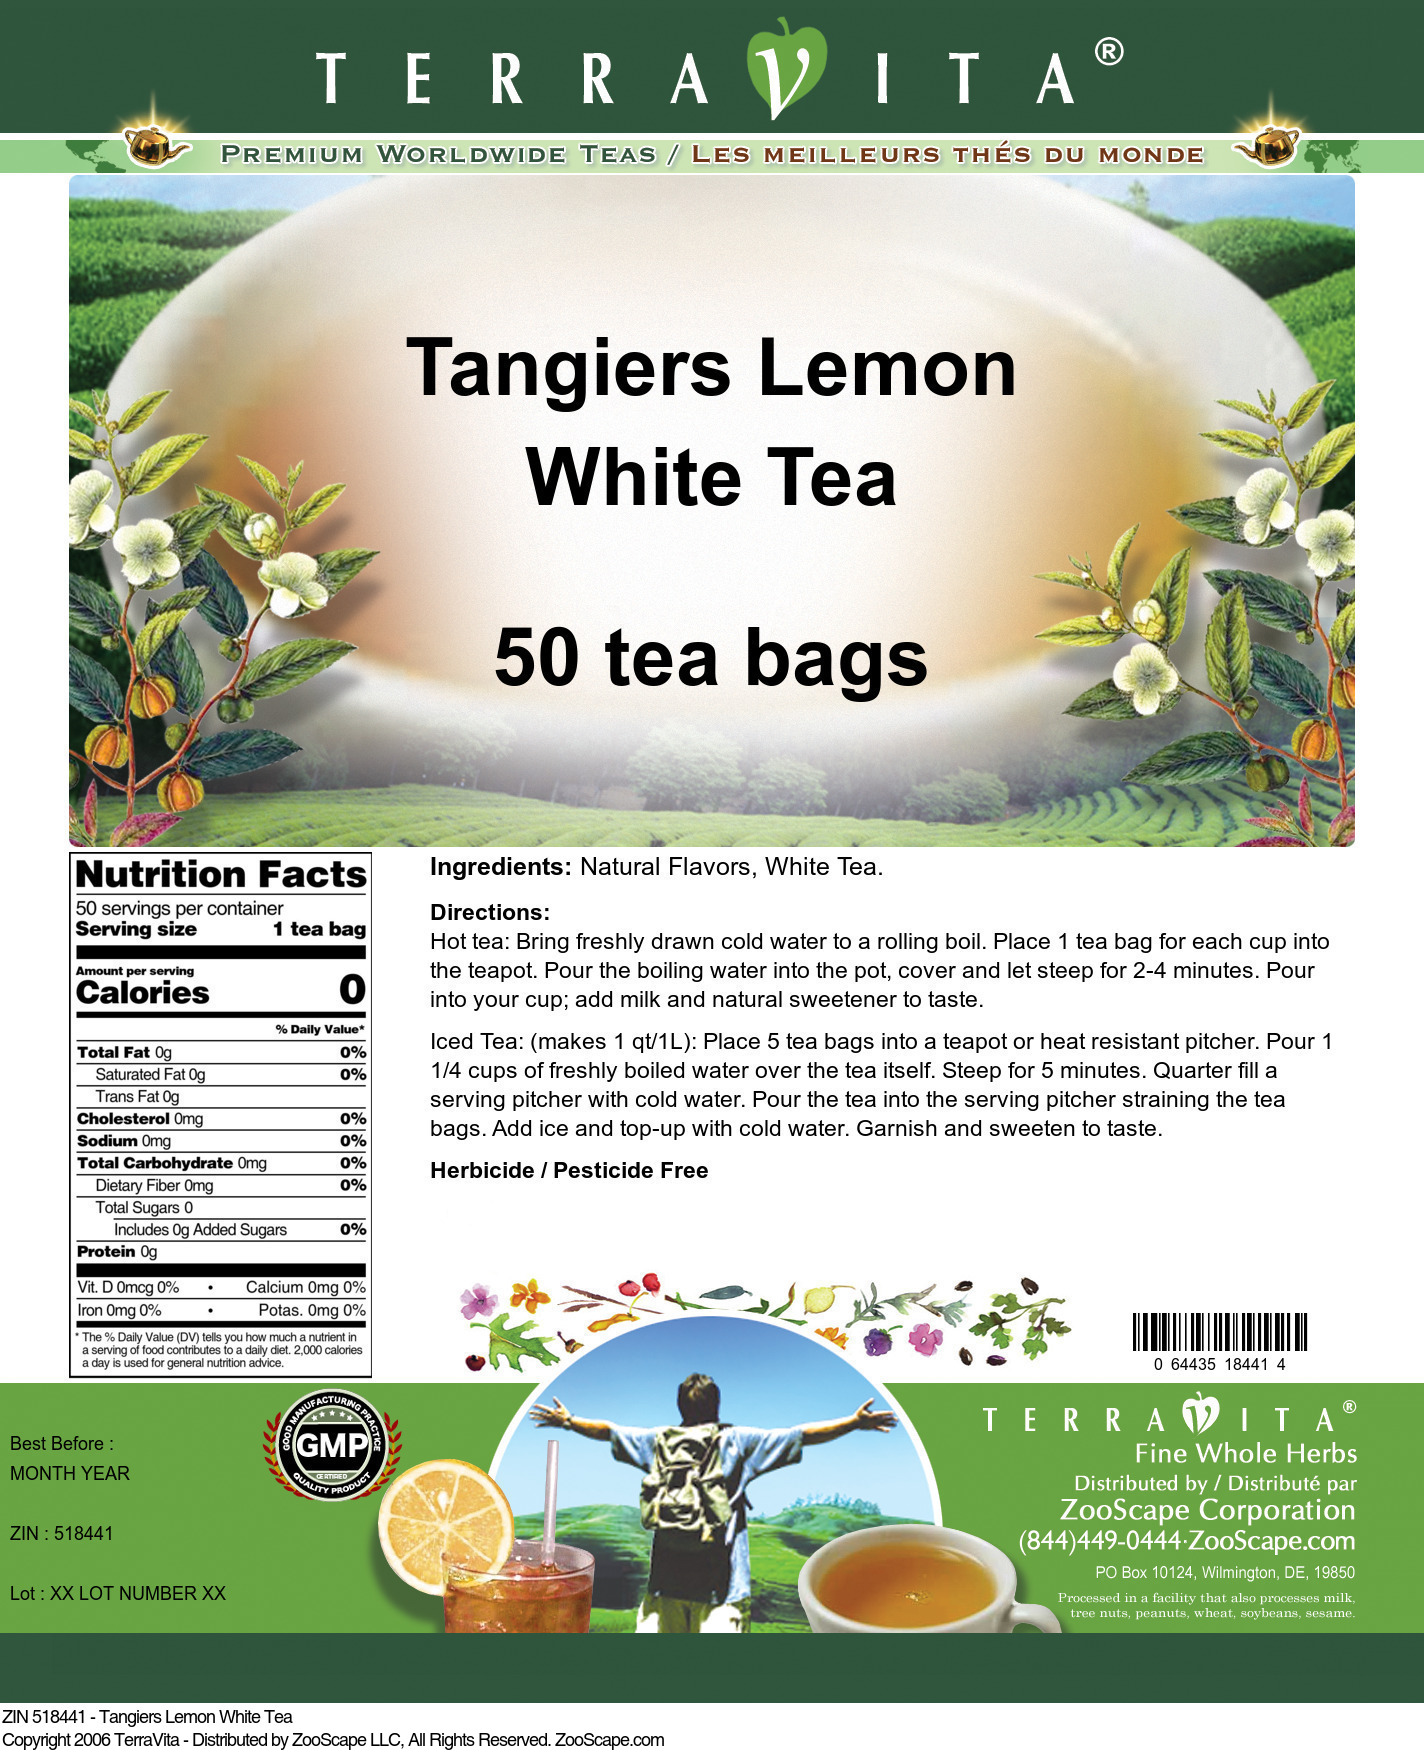 Tangiers Lemon White Tea